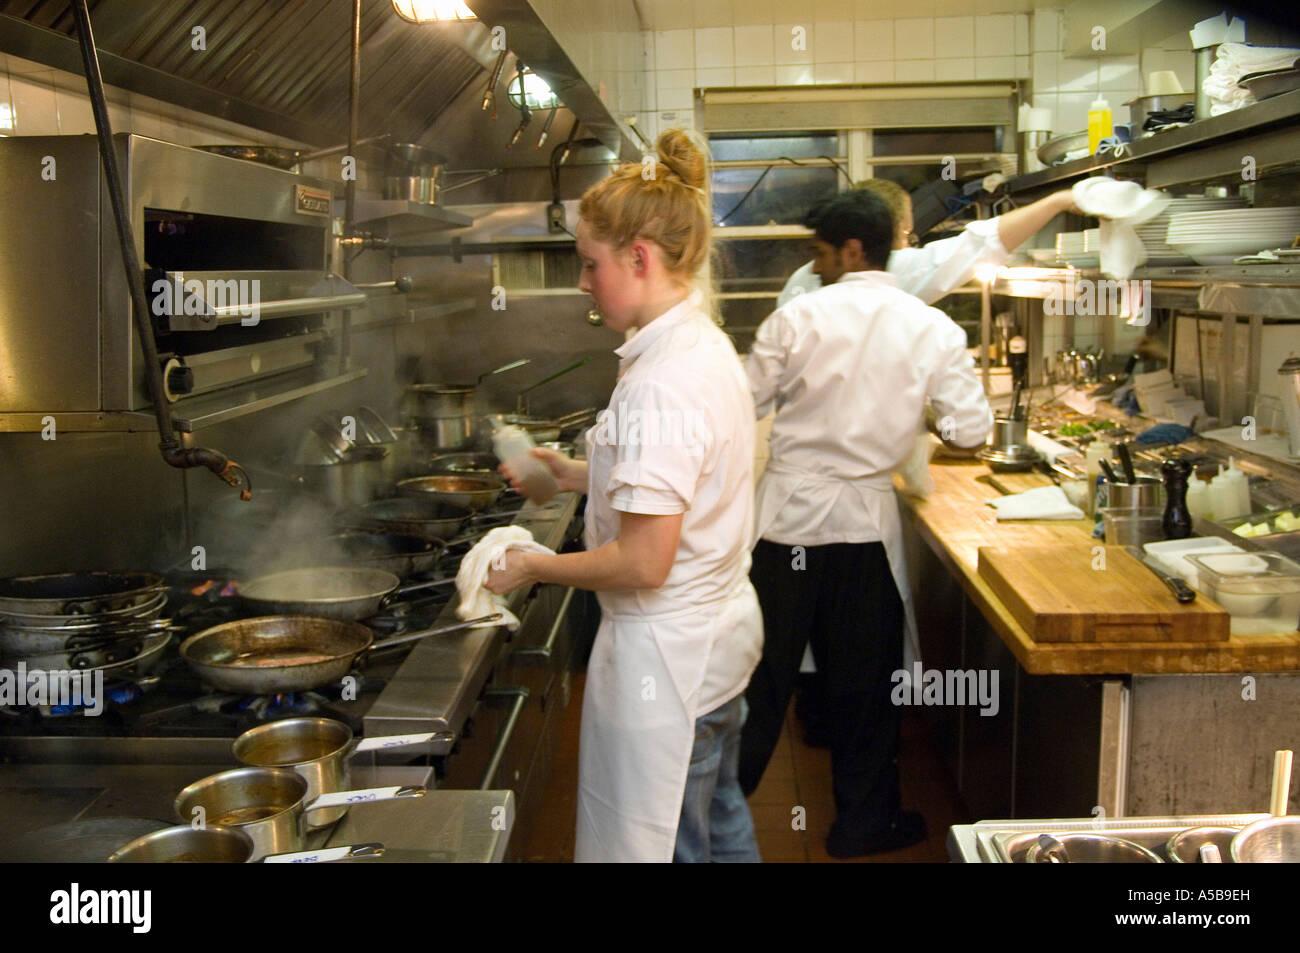 Busy Restaurant Kitchen team of restaurant kitchen staff busy at work stock photo, royalty